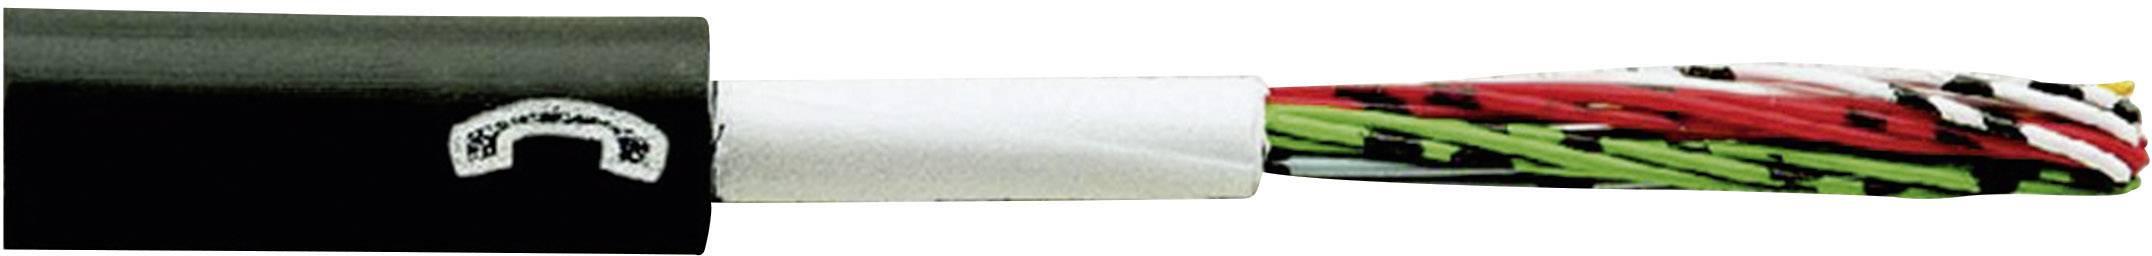 Telefónny kábel A-2Y(L)2Y Faber Kabel 110024, 4 x 2 x 0.8 mm, čierna, metrový tovar